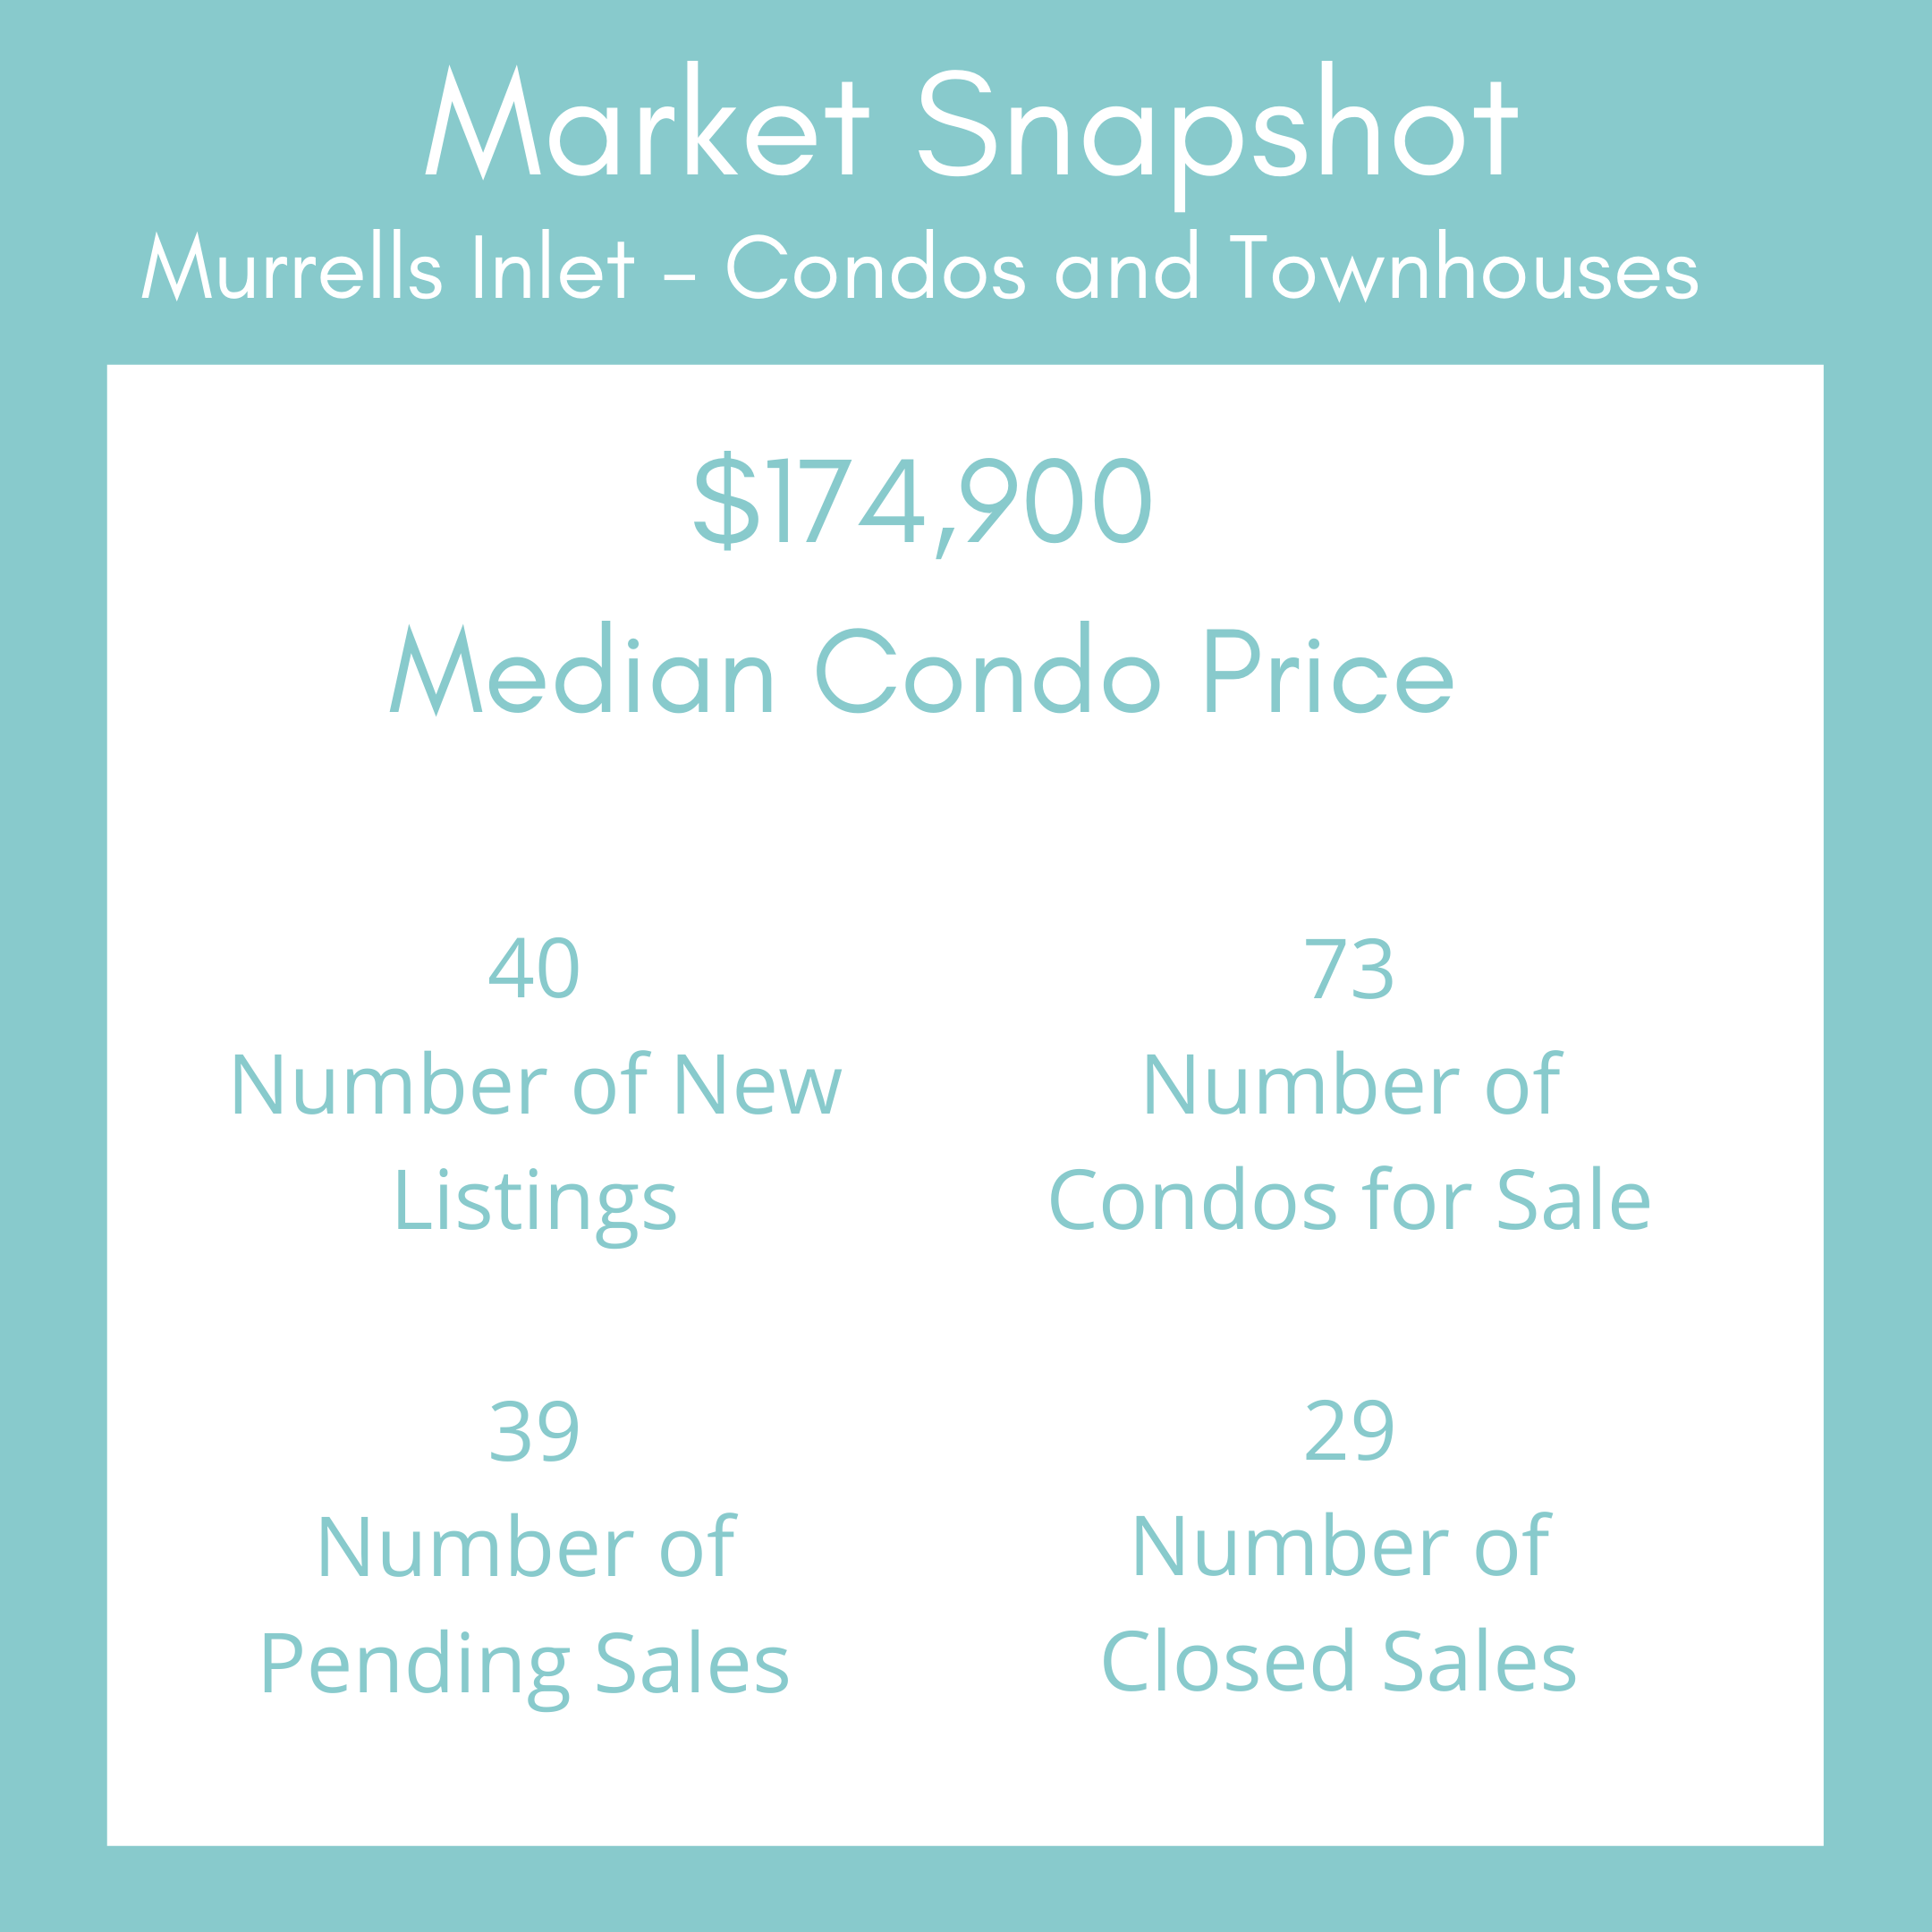 Market Snapshot Template - Murrells Inlet Condos Feb 2021